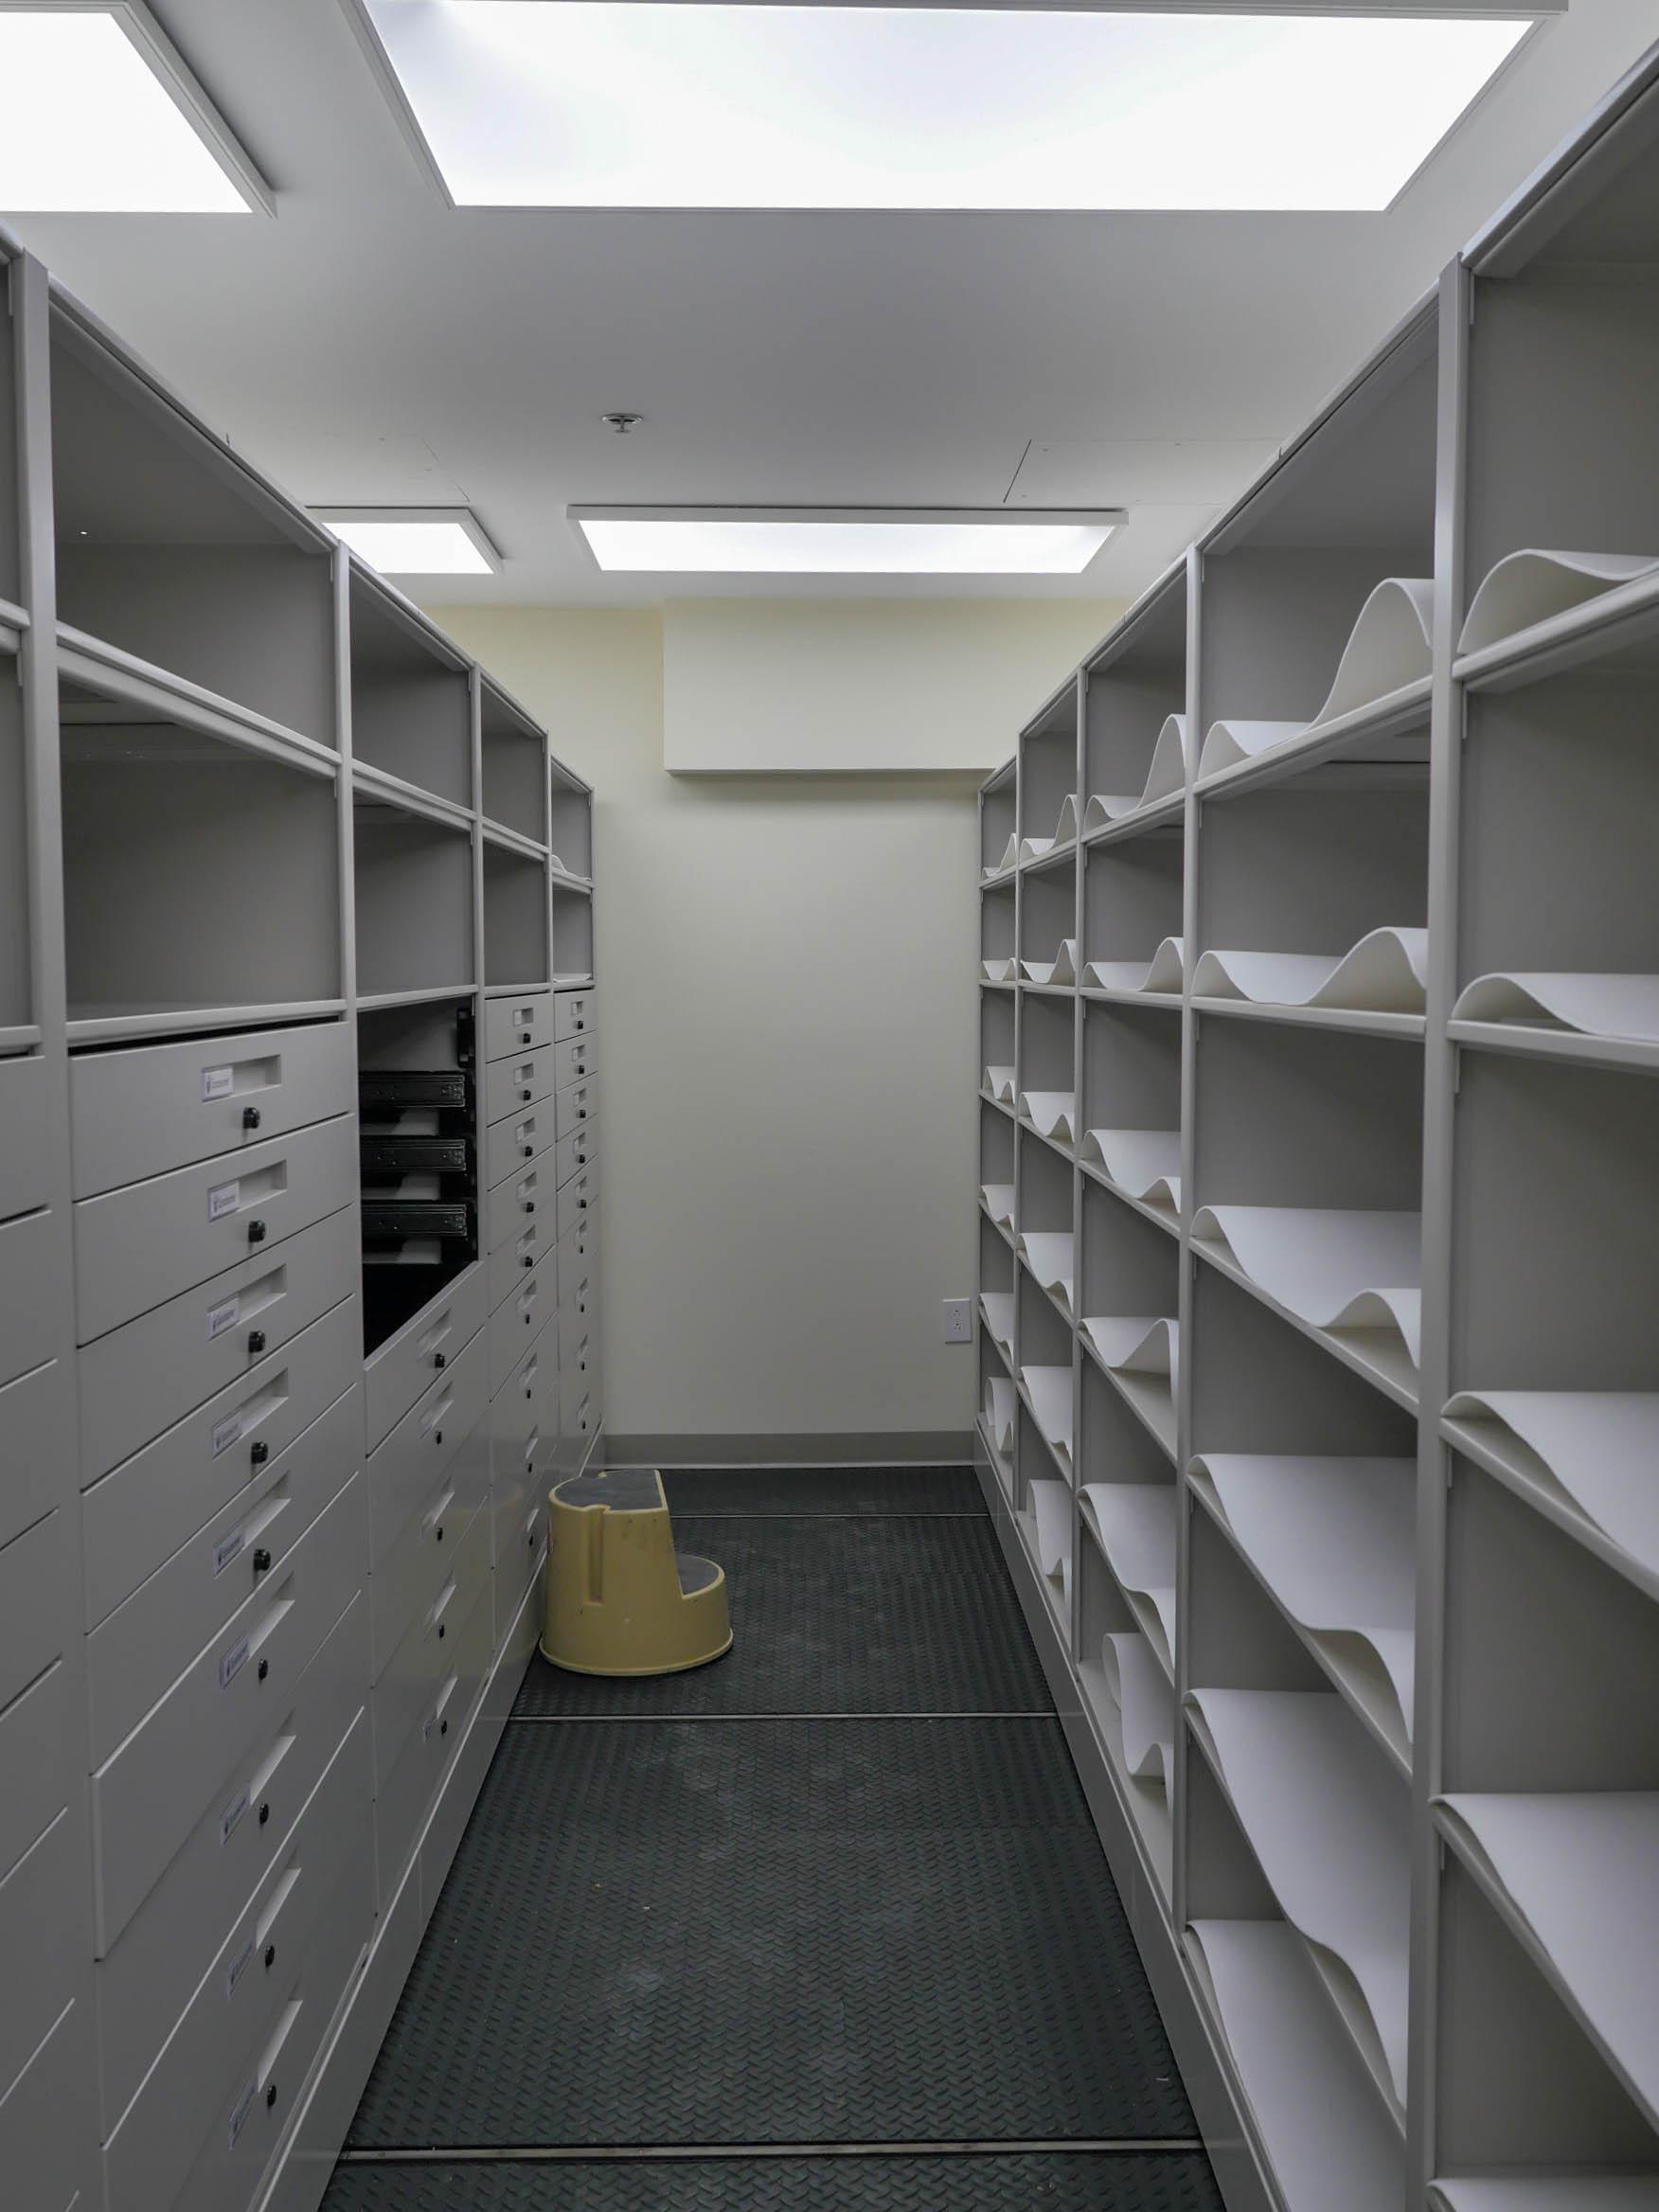 anthropology storage